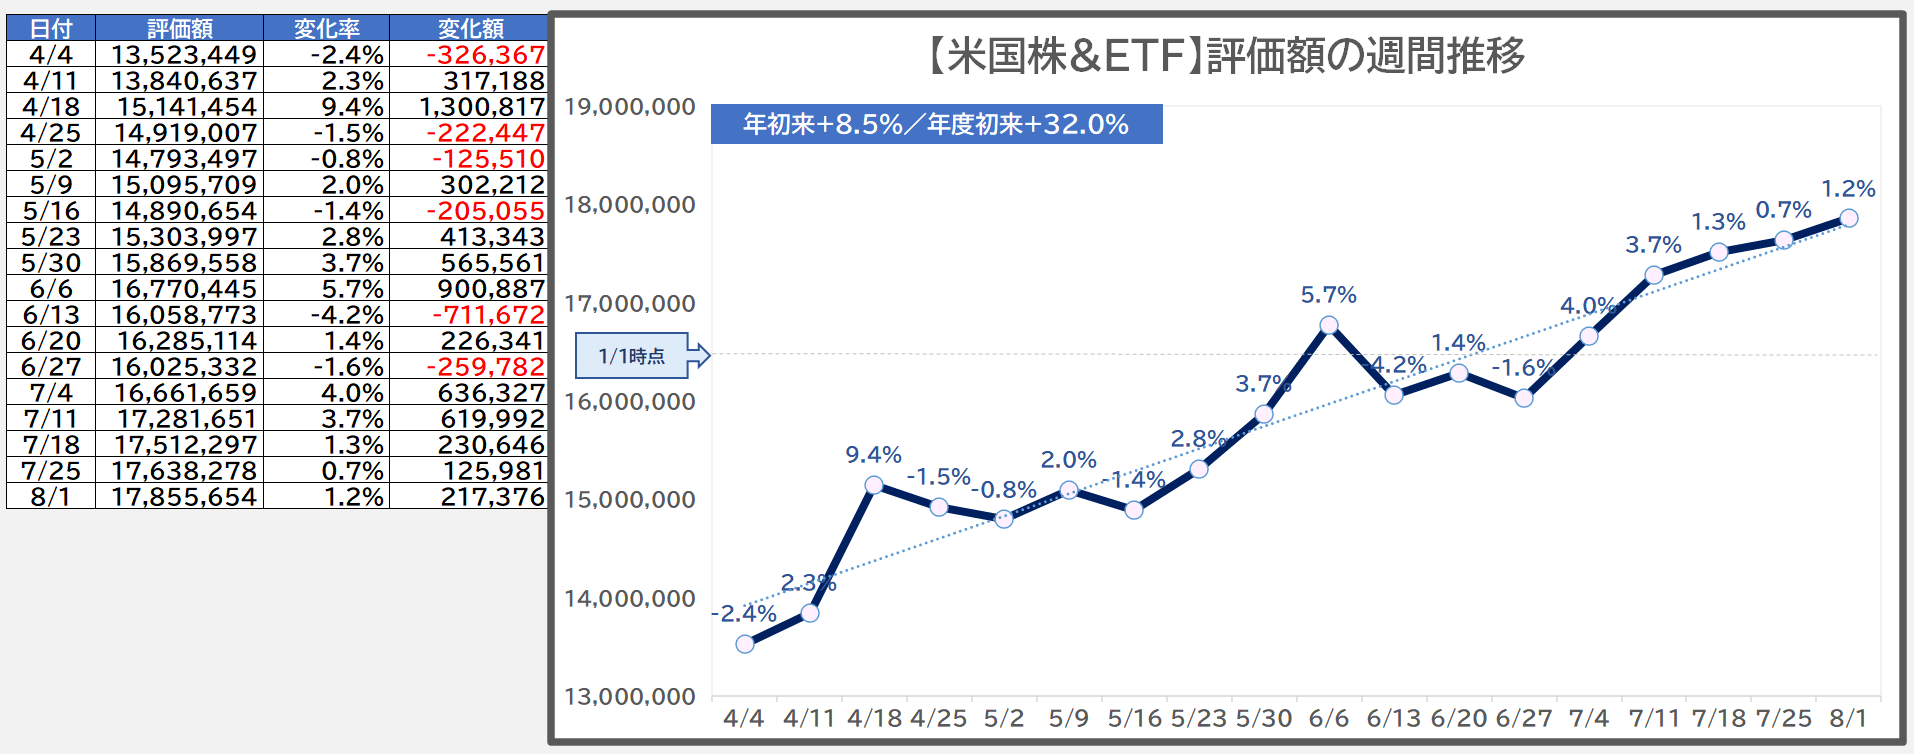 米国株の評価額週間推移